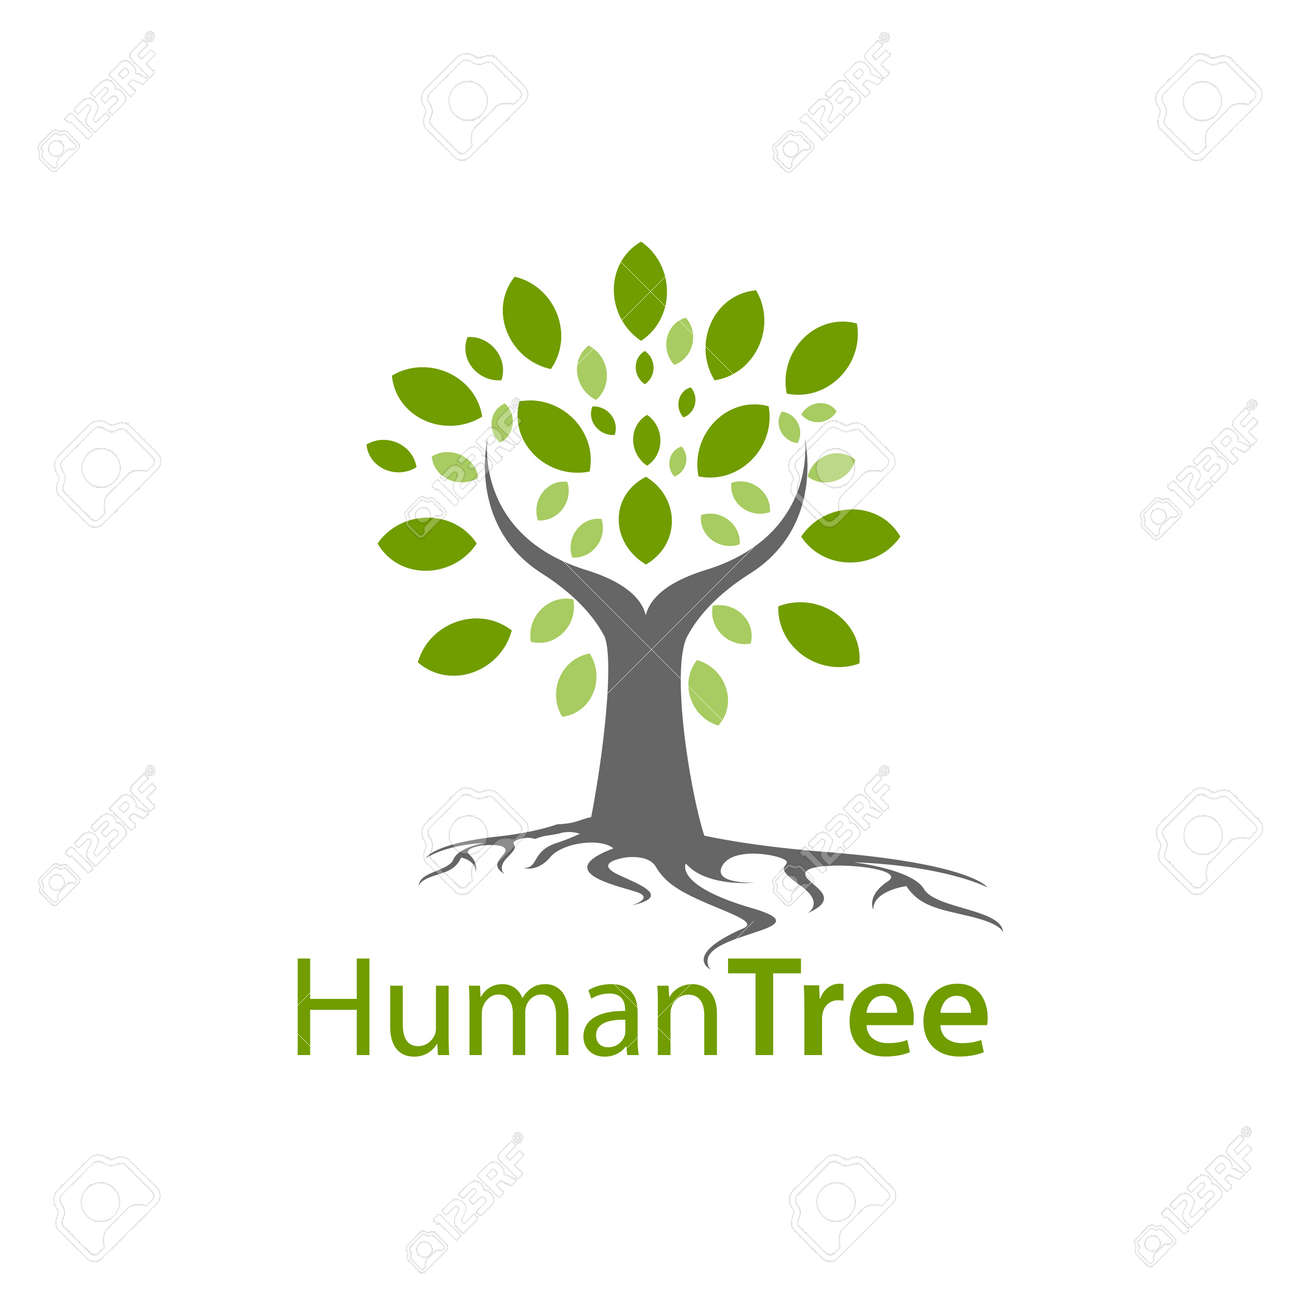 Human tree logo concept design. Symbol graphic template element vector - 143647671